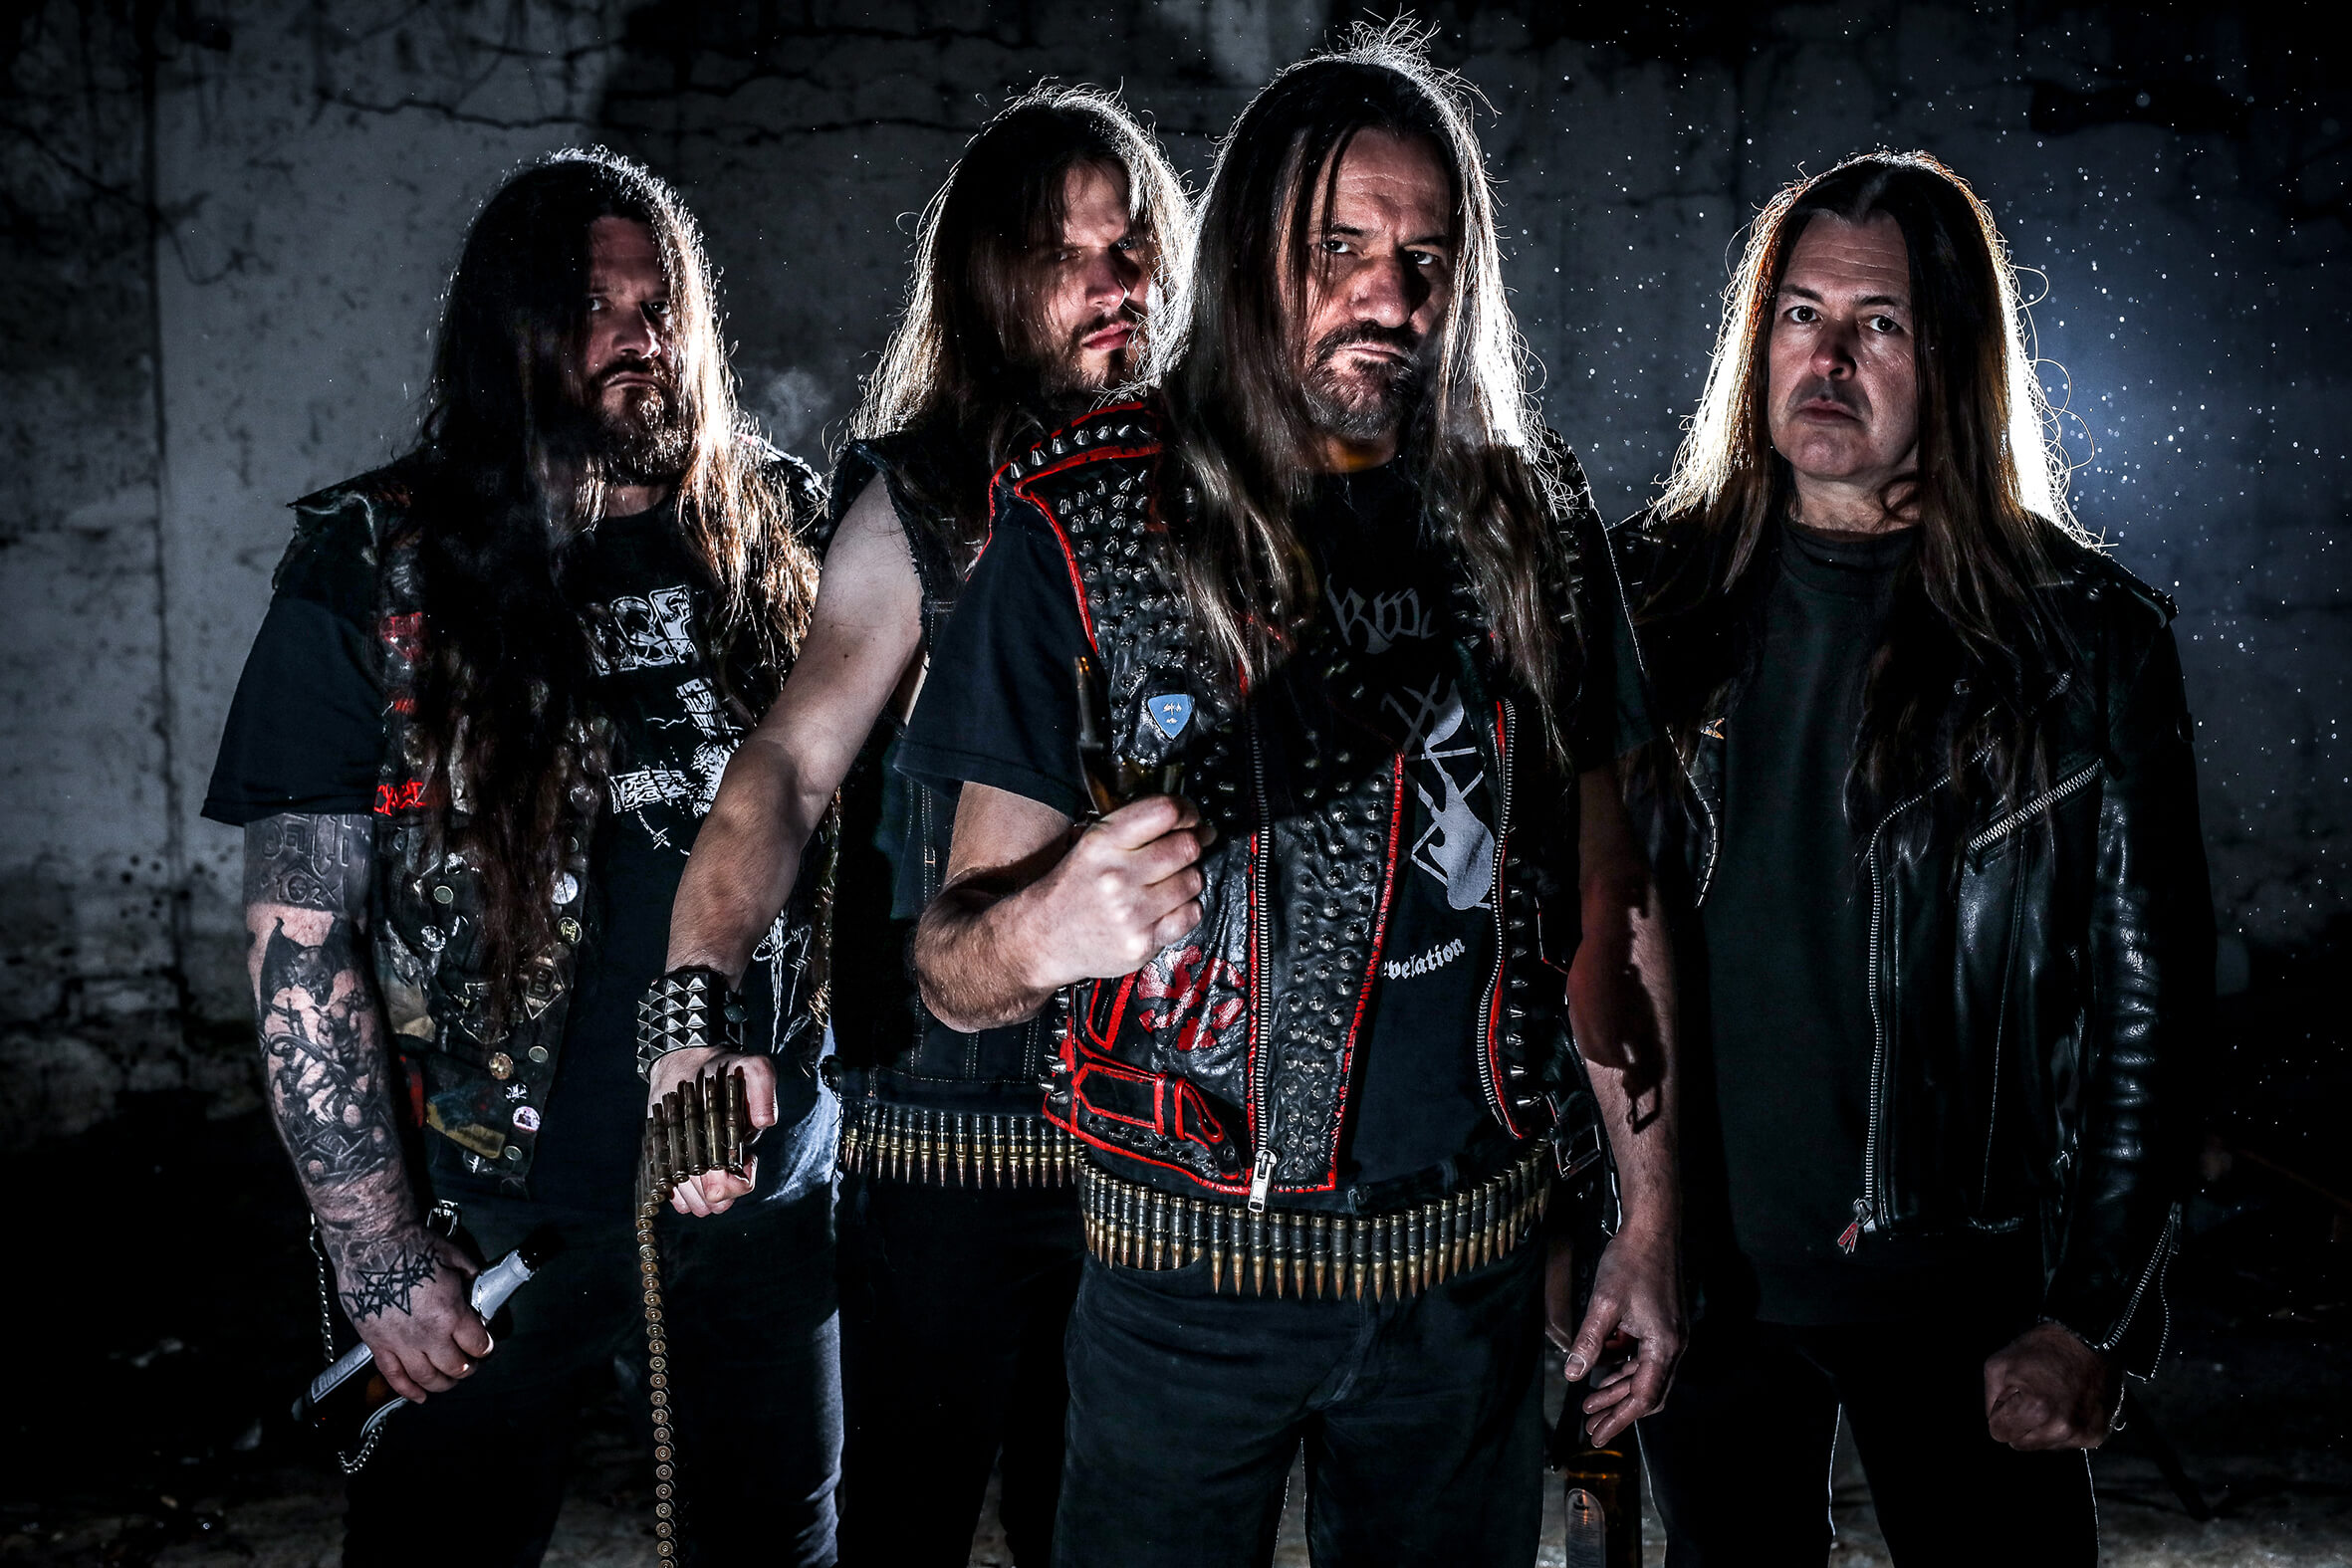 Sodom - 20th Anniversary Edition of the Anti-War Album